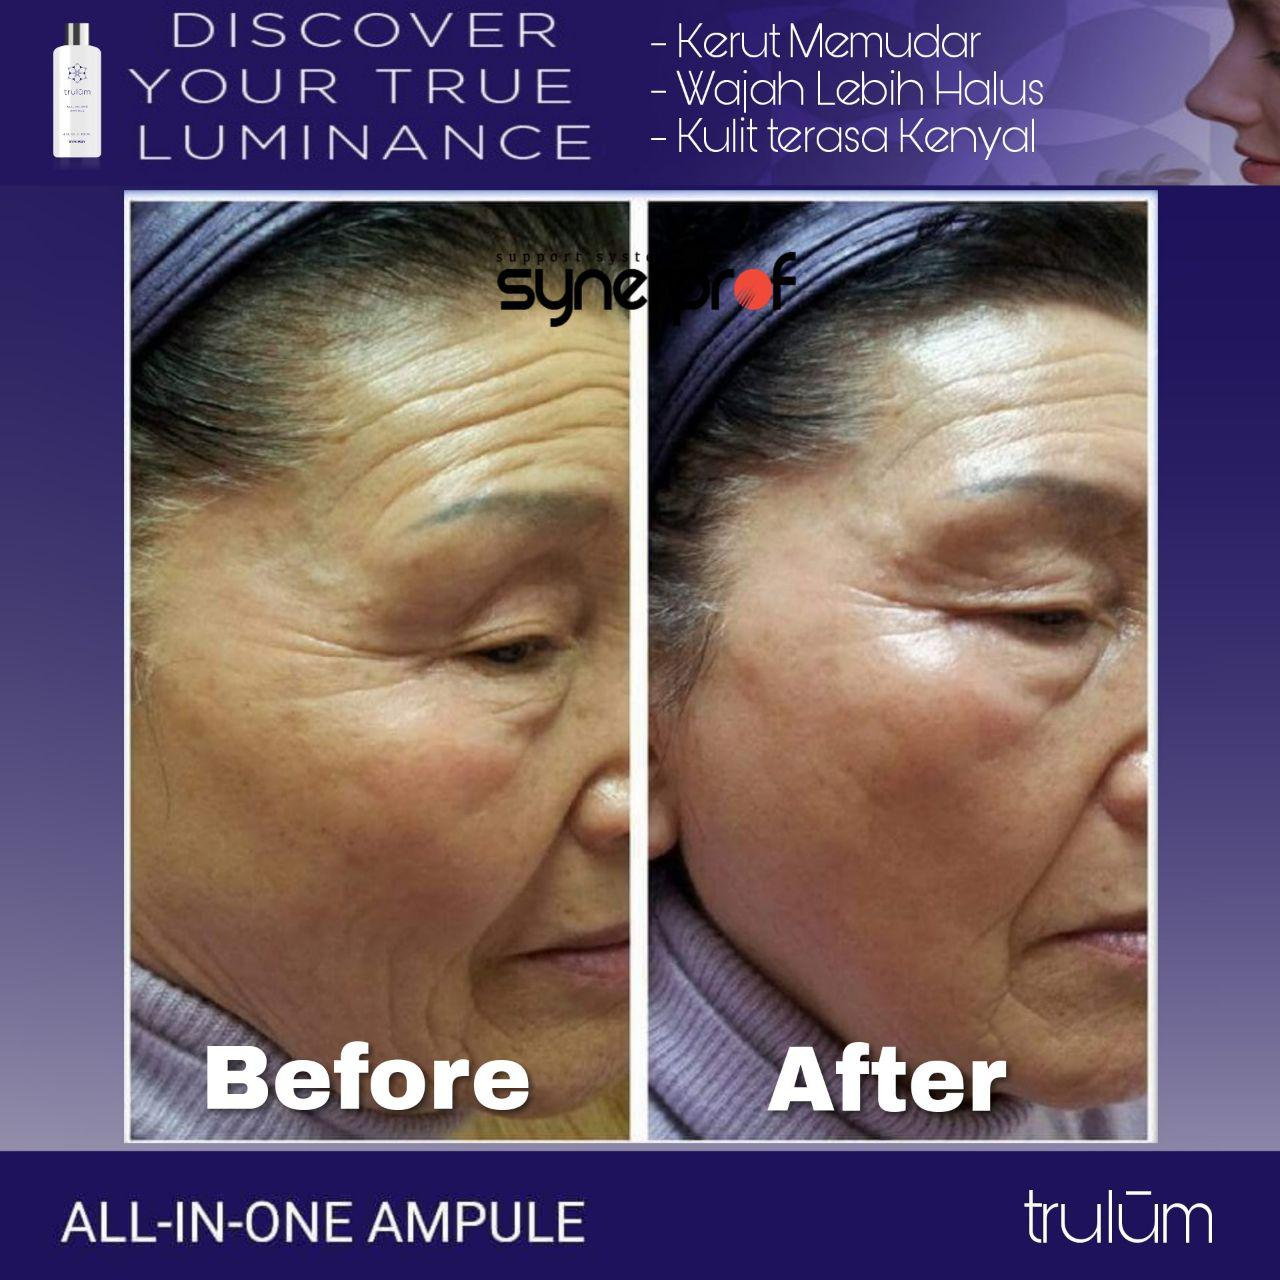 Klinik Kecantikan Trulum Skincare Di Pulo Berayan Kota, Medan Barat WA: 08112338376